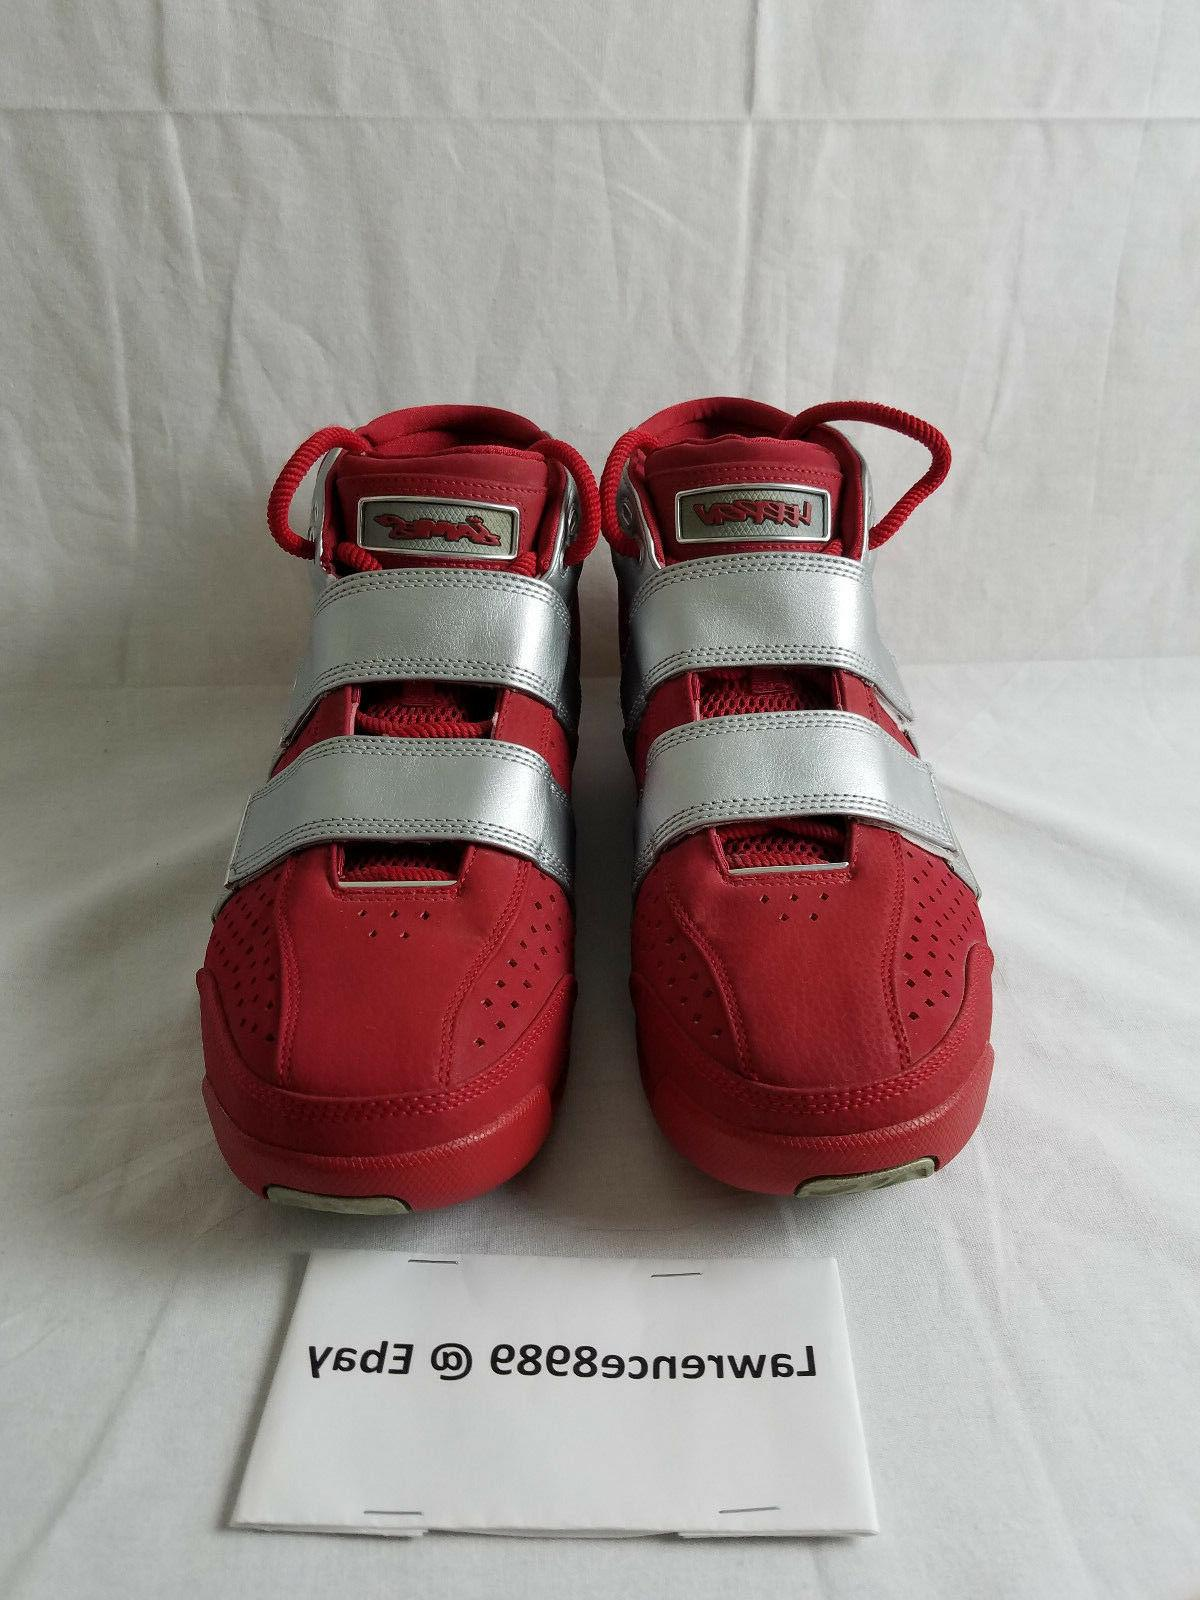 Rare Nike 20-5-5 Basketball Shoes 2 3 6